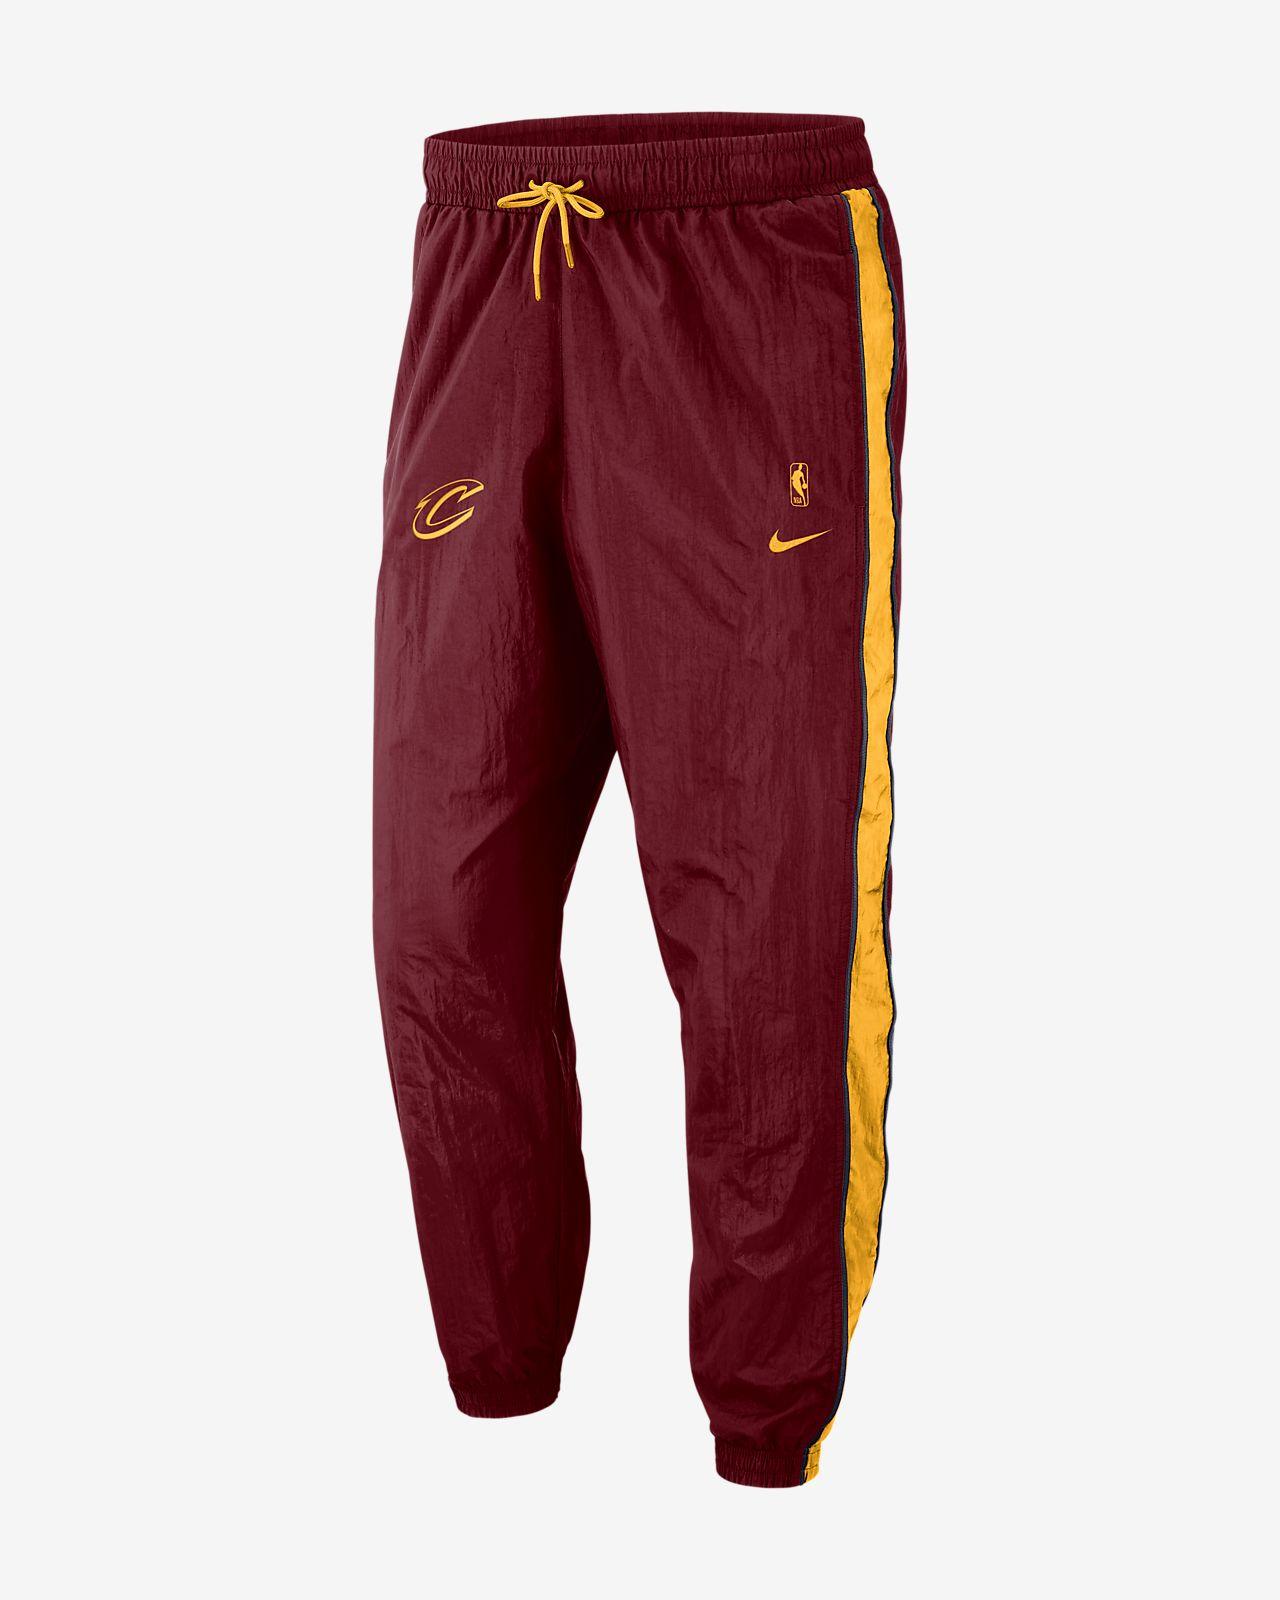 d97da98c0ea8 Cleveland Cavaliers Nike Men s NBA Tracksuit Pants. Nike.com